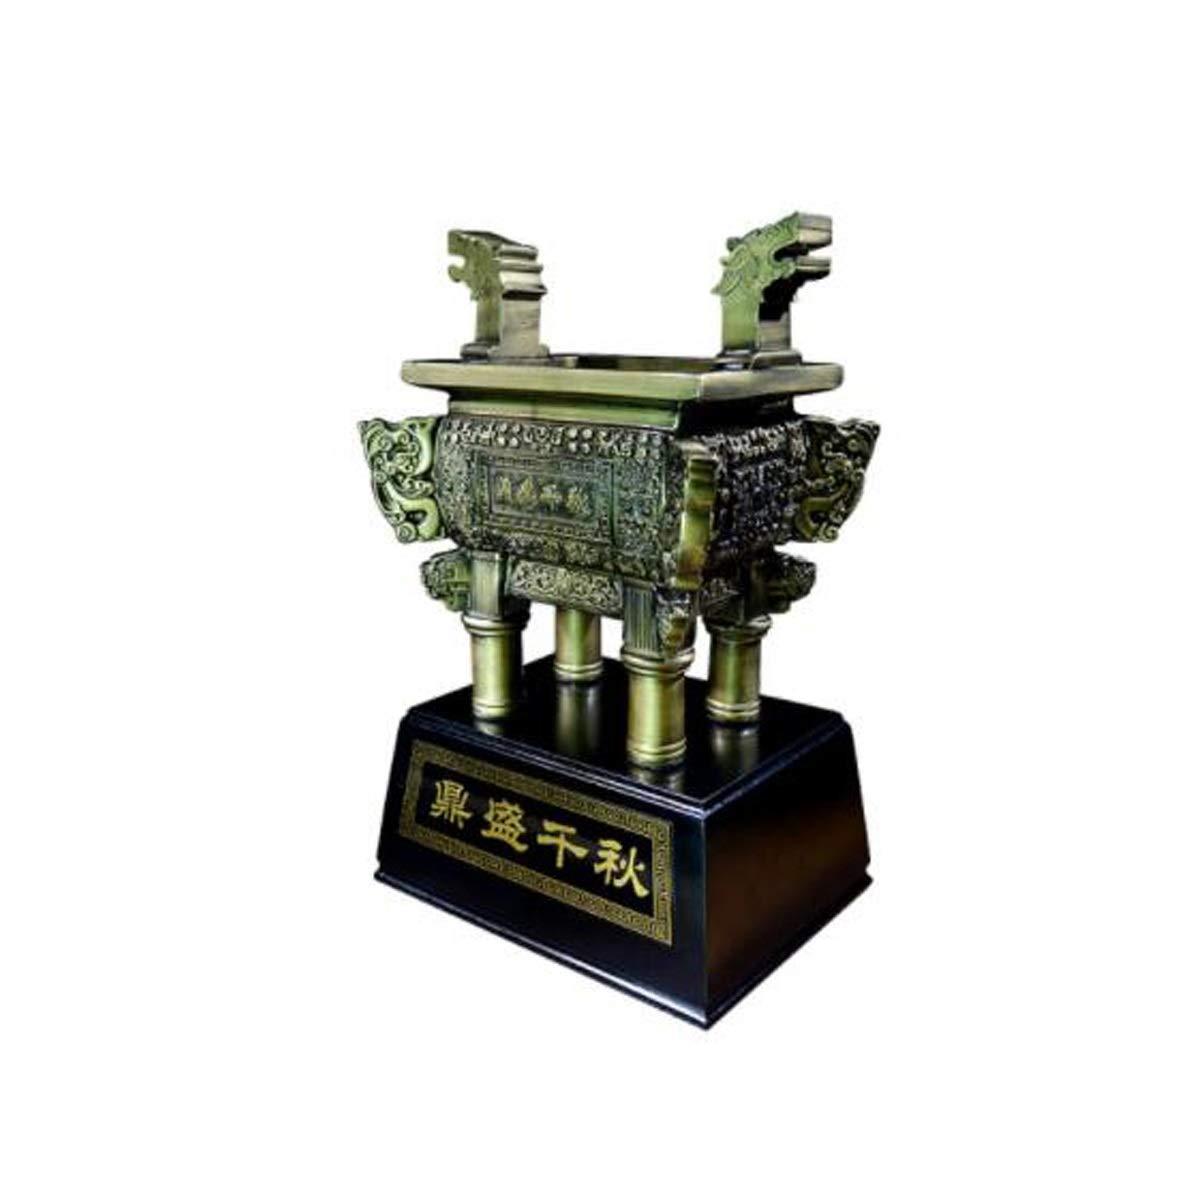 XIONGHAIZI 装飾、オープニングハウスウォーミングギフトDingの装飾品、ラッキーフォーチュン、ビジネスギフト、上司のオフィスの装飾、レジ係のフロントの装飾、Send Partners (Edition : Medium-24*20*39cm) B07SJRRD1N  Medium-24*20*39cm